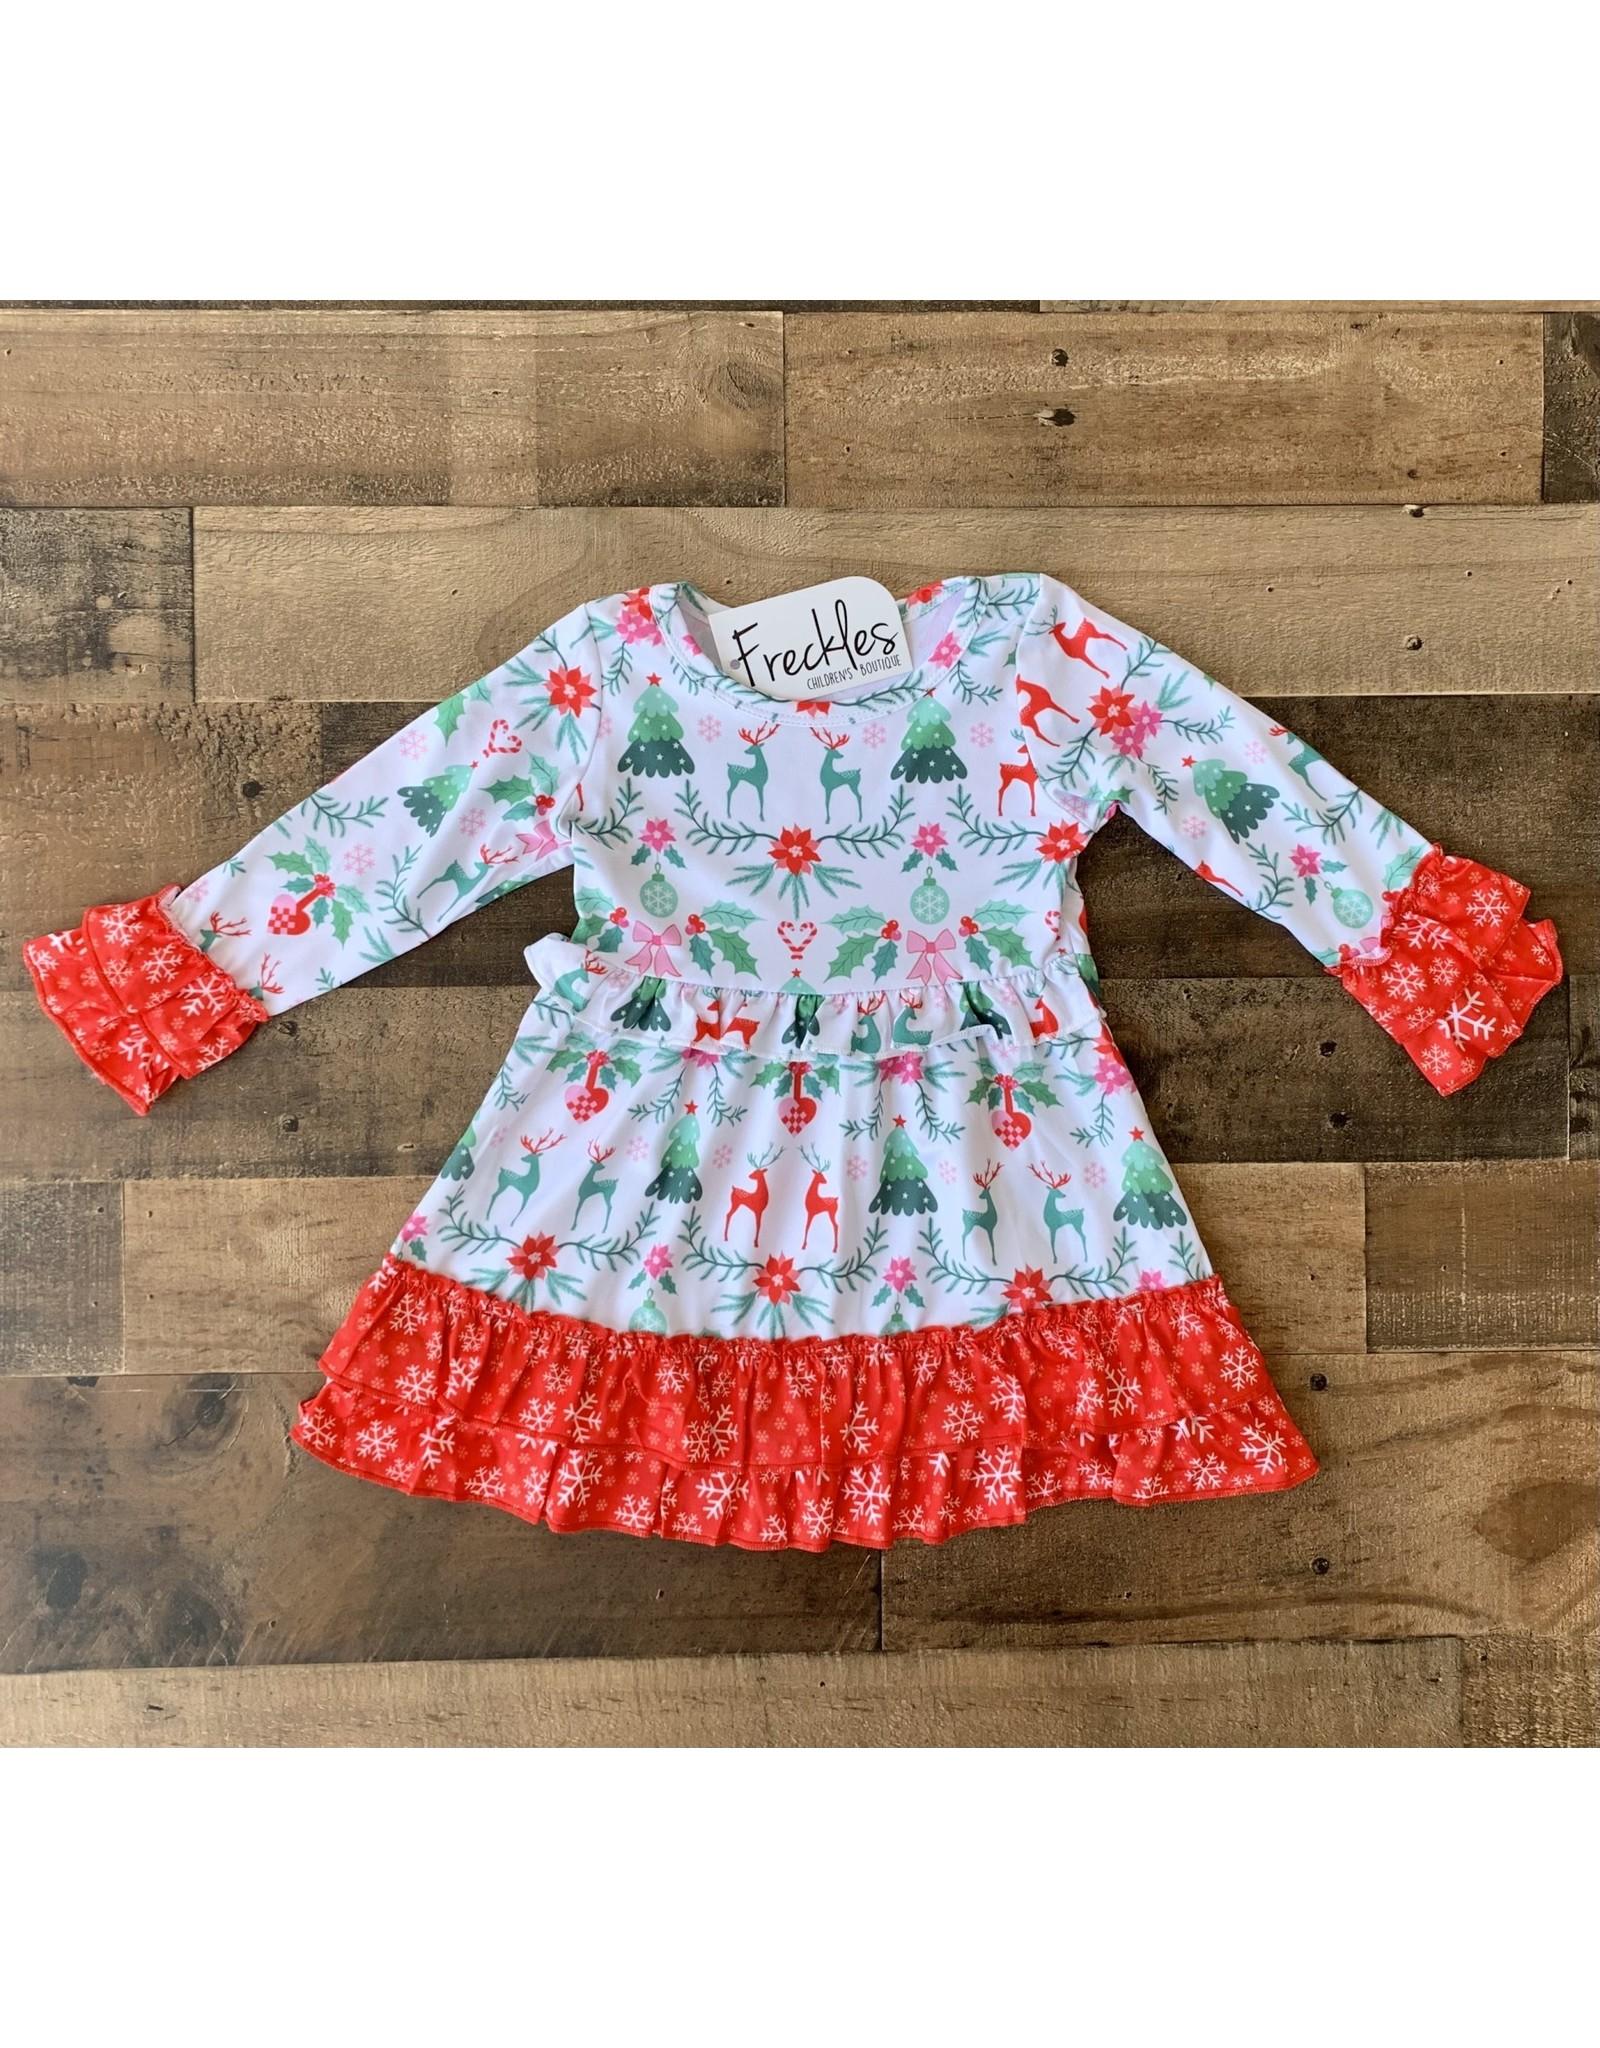 Holly Jolly Christmas Dress